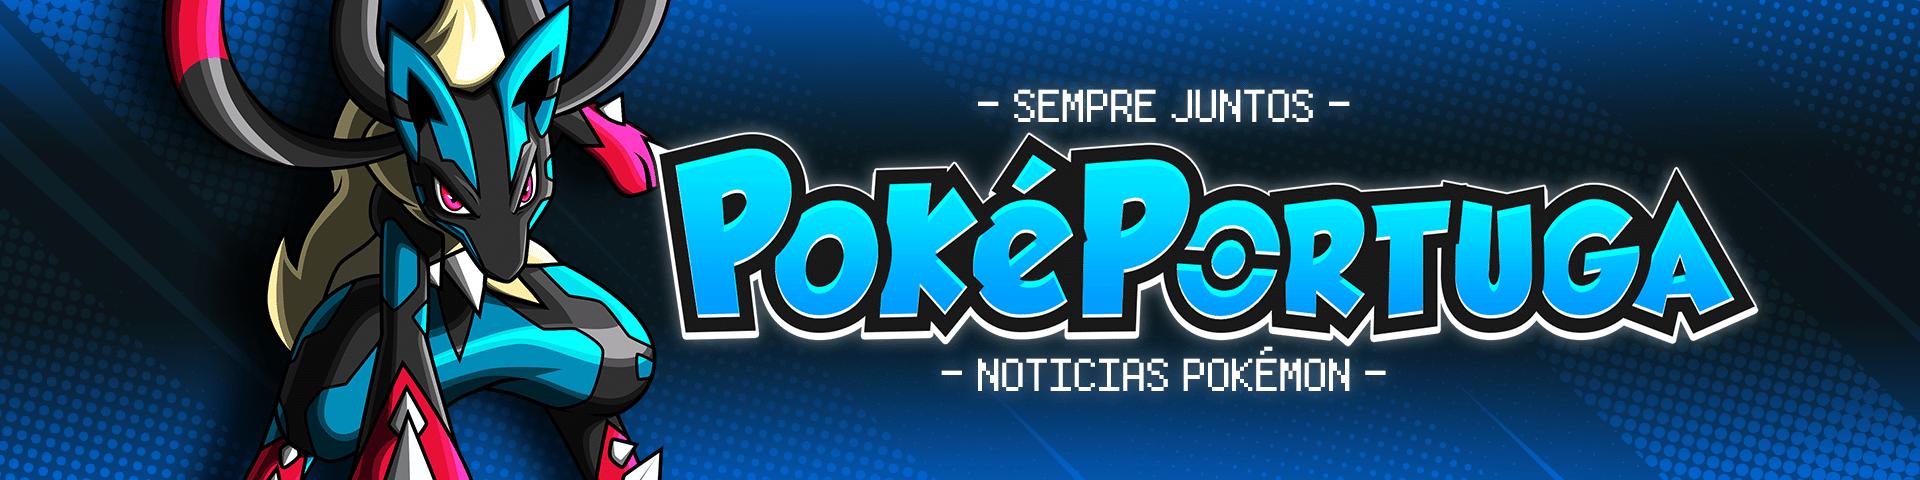 PokéPortuga